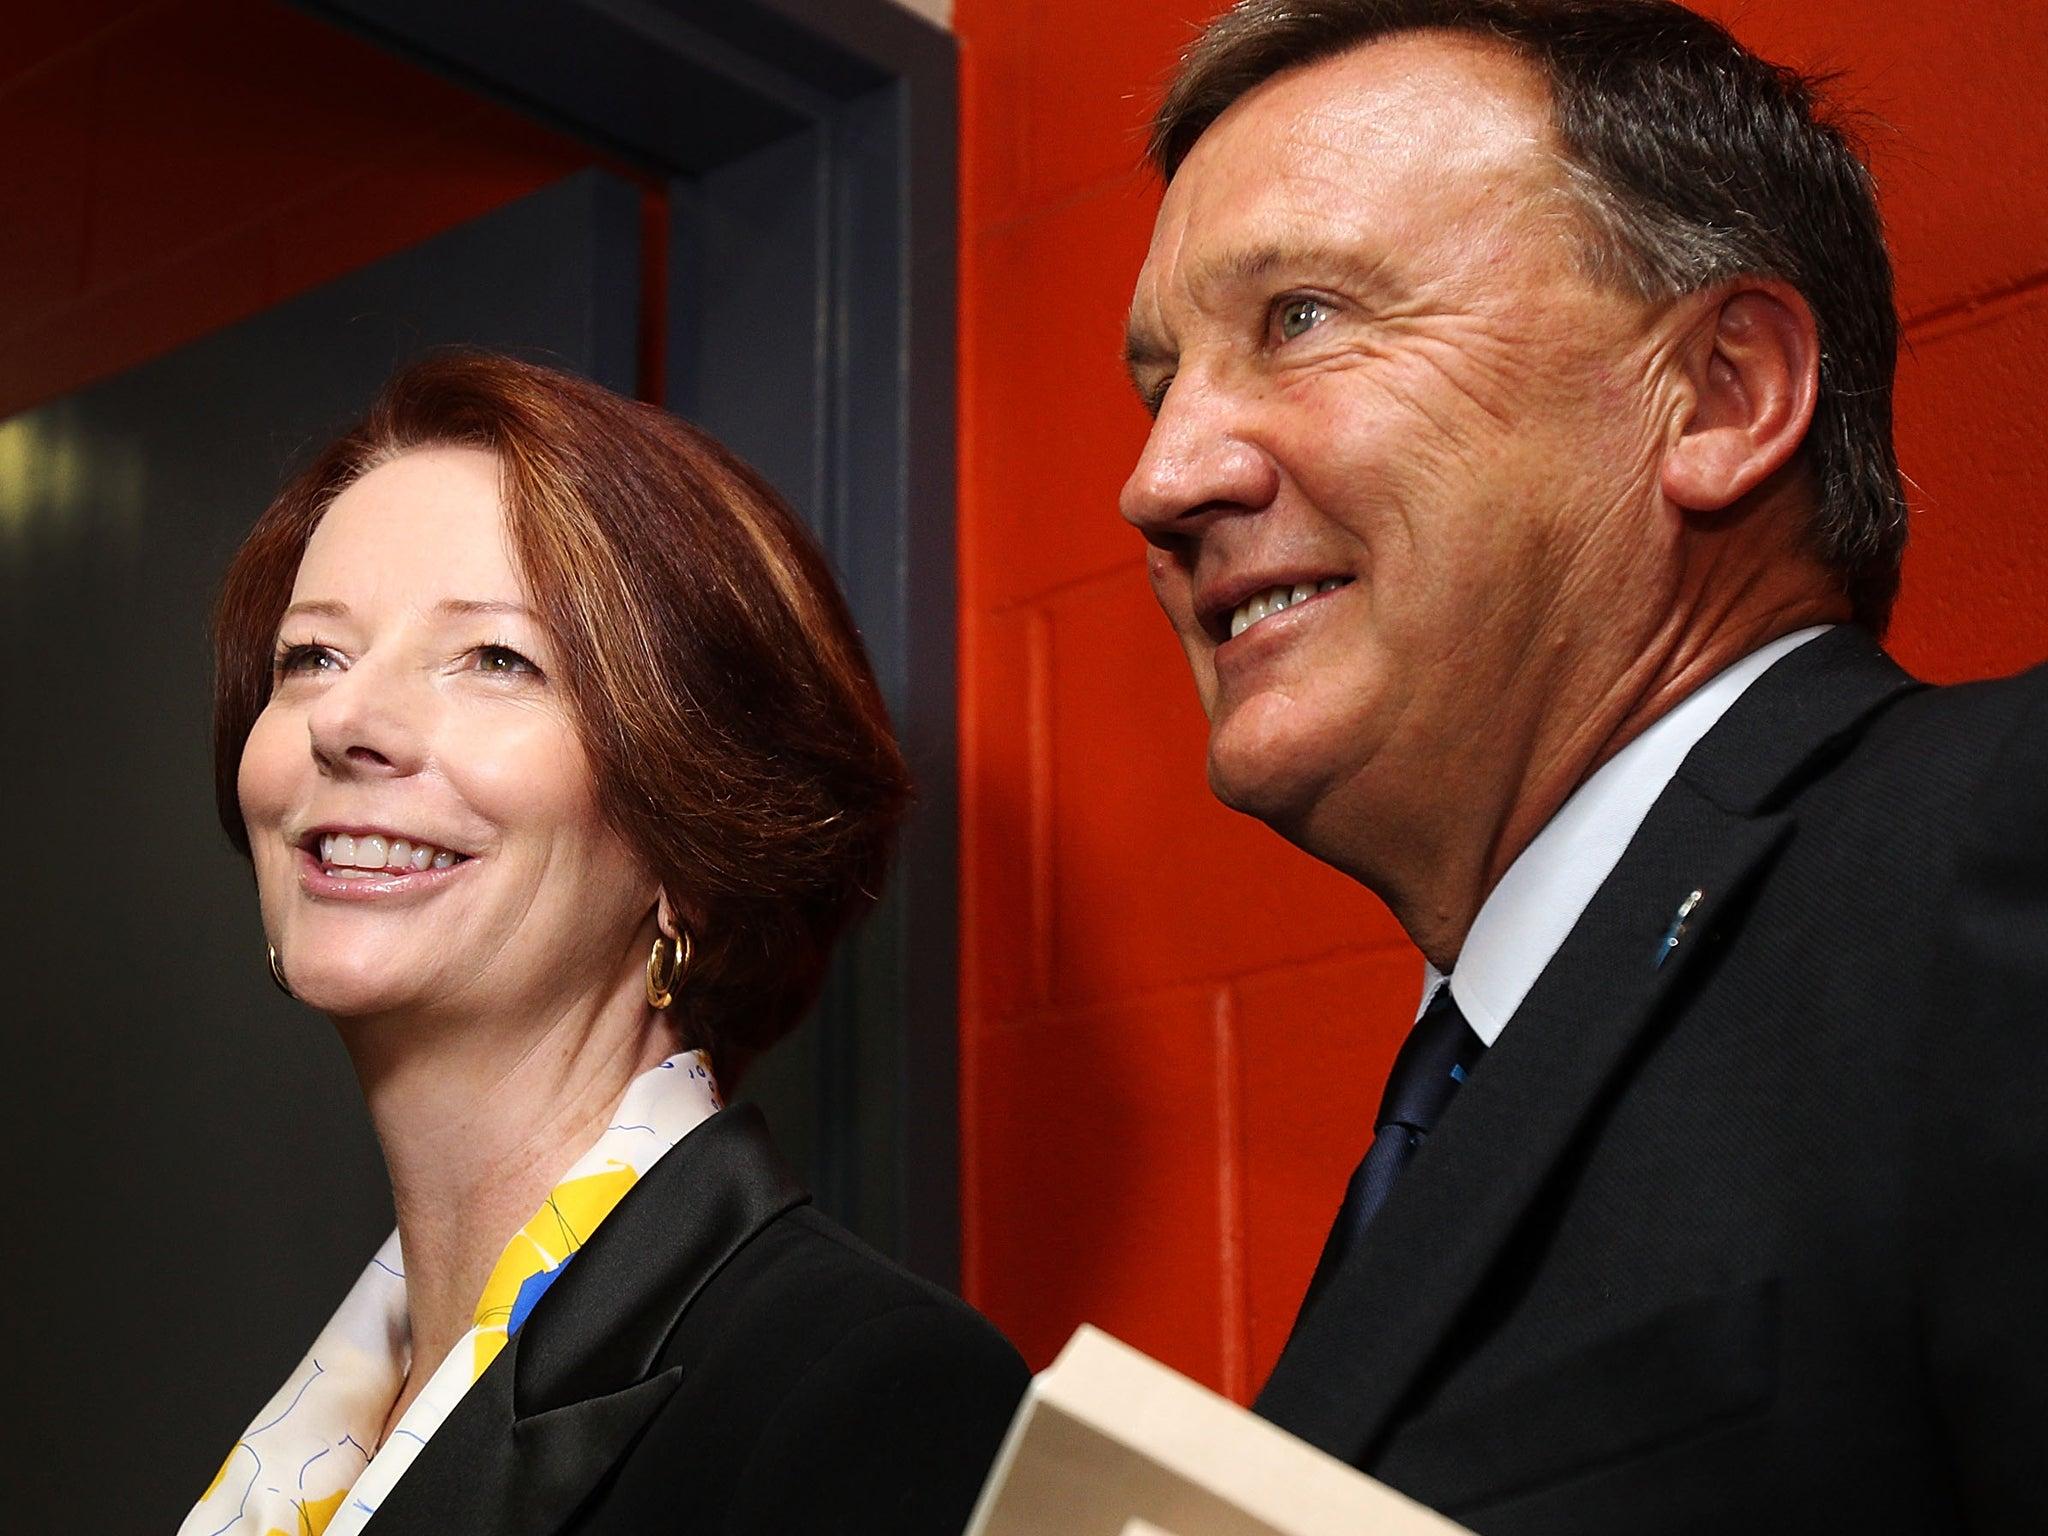 Tim Mathieson Is Australias gaffeprone First Bloke the new Duke of Edinburgh